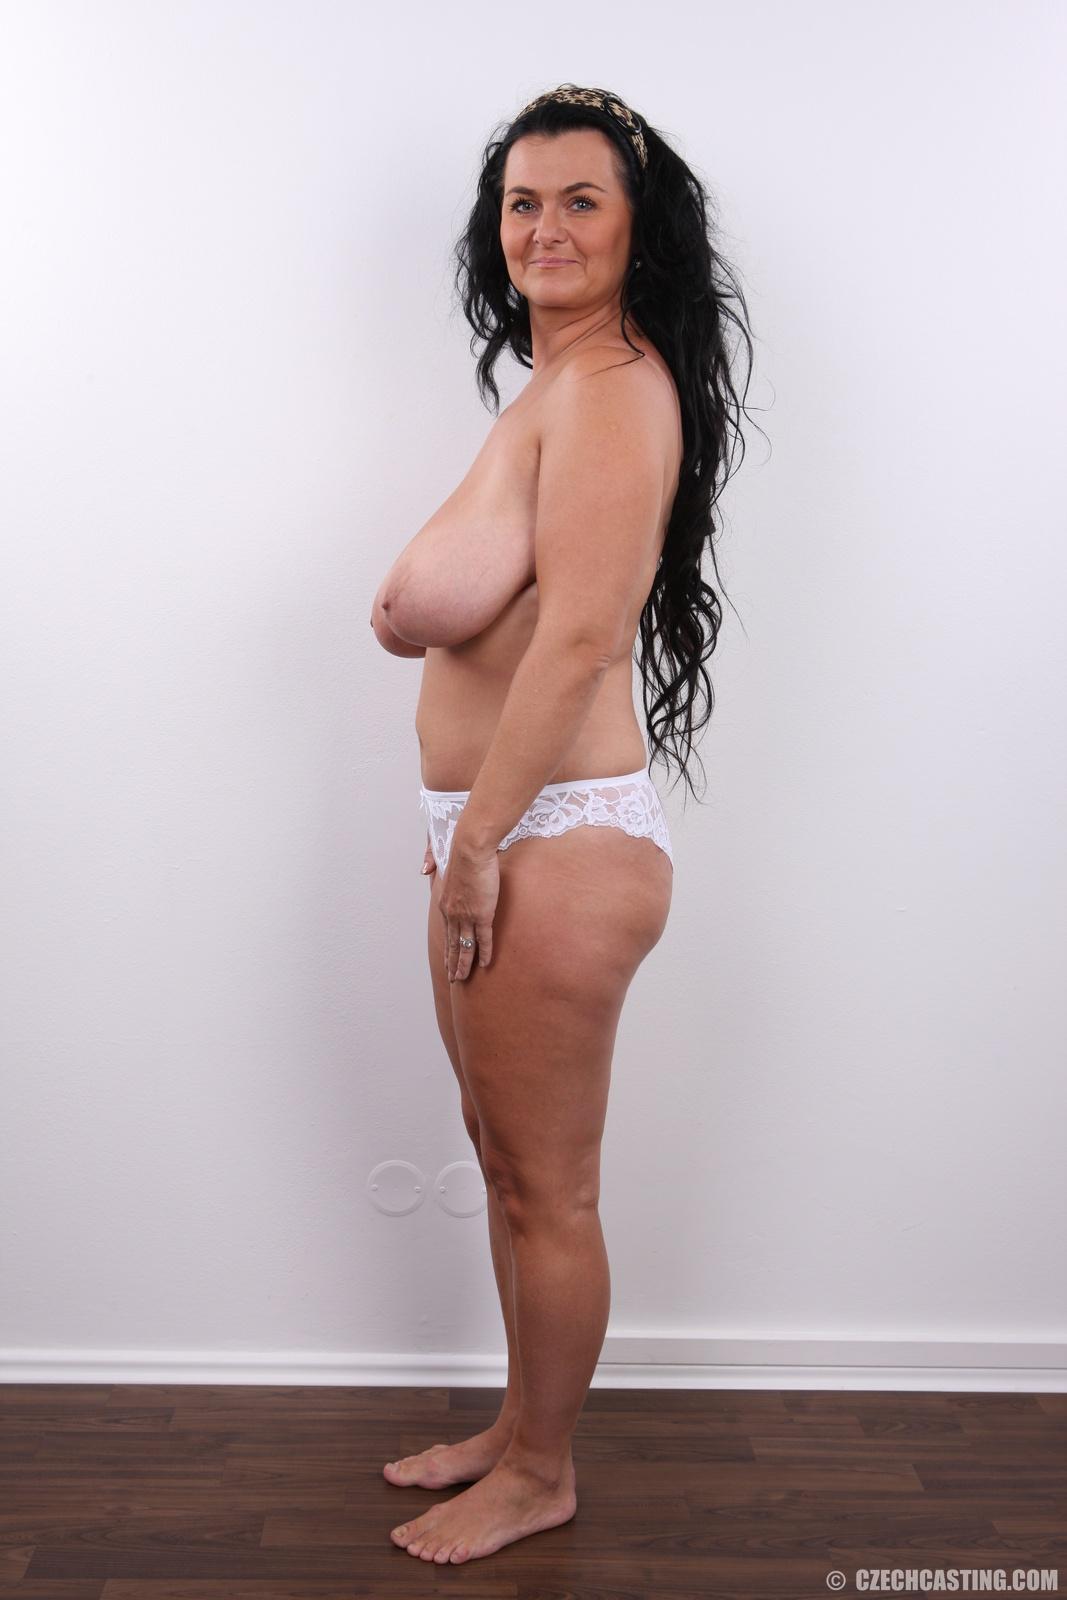 Claudia schiffer paparazzi nude